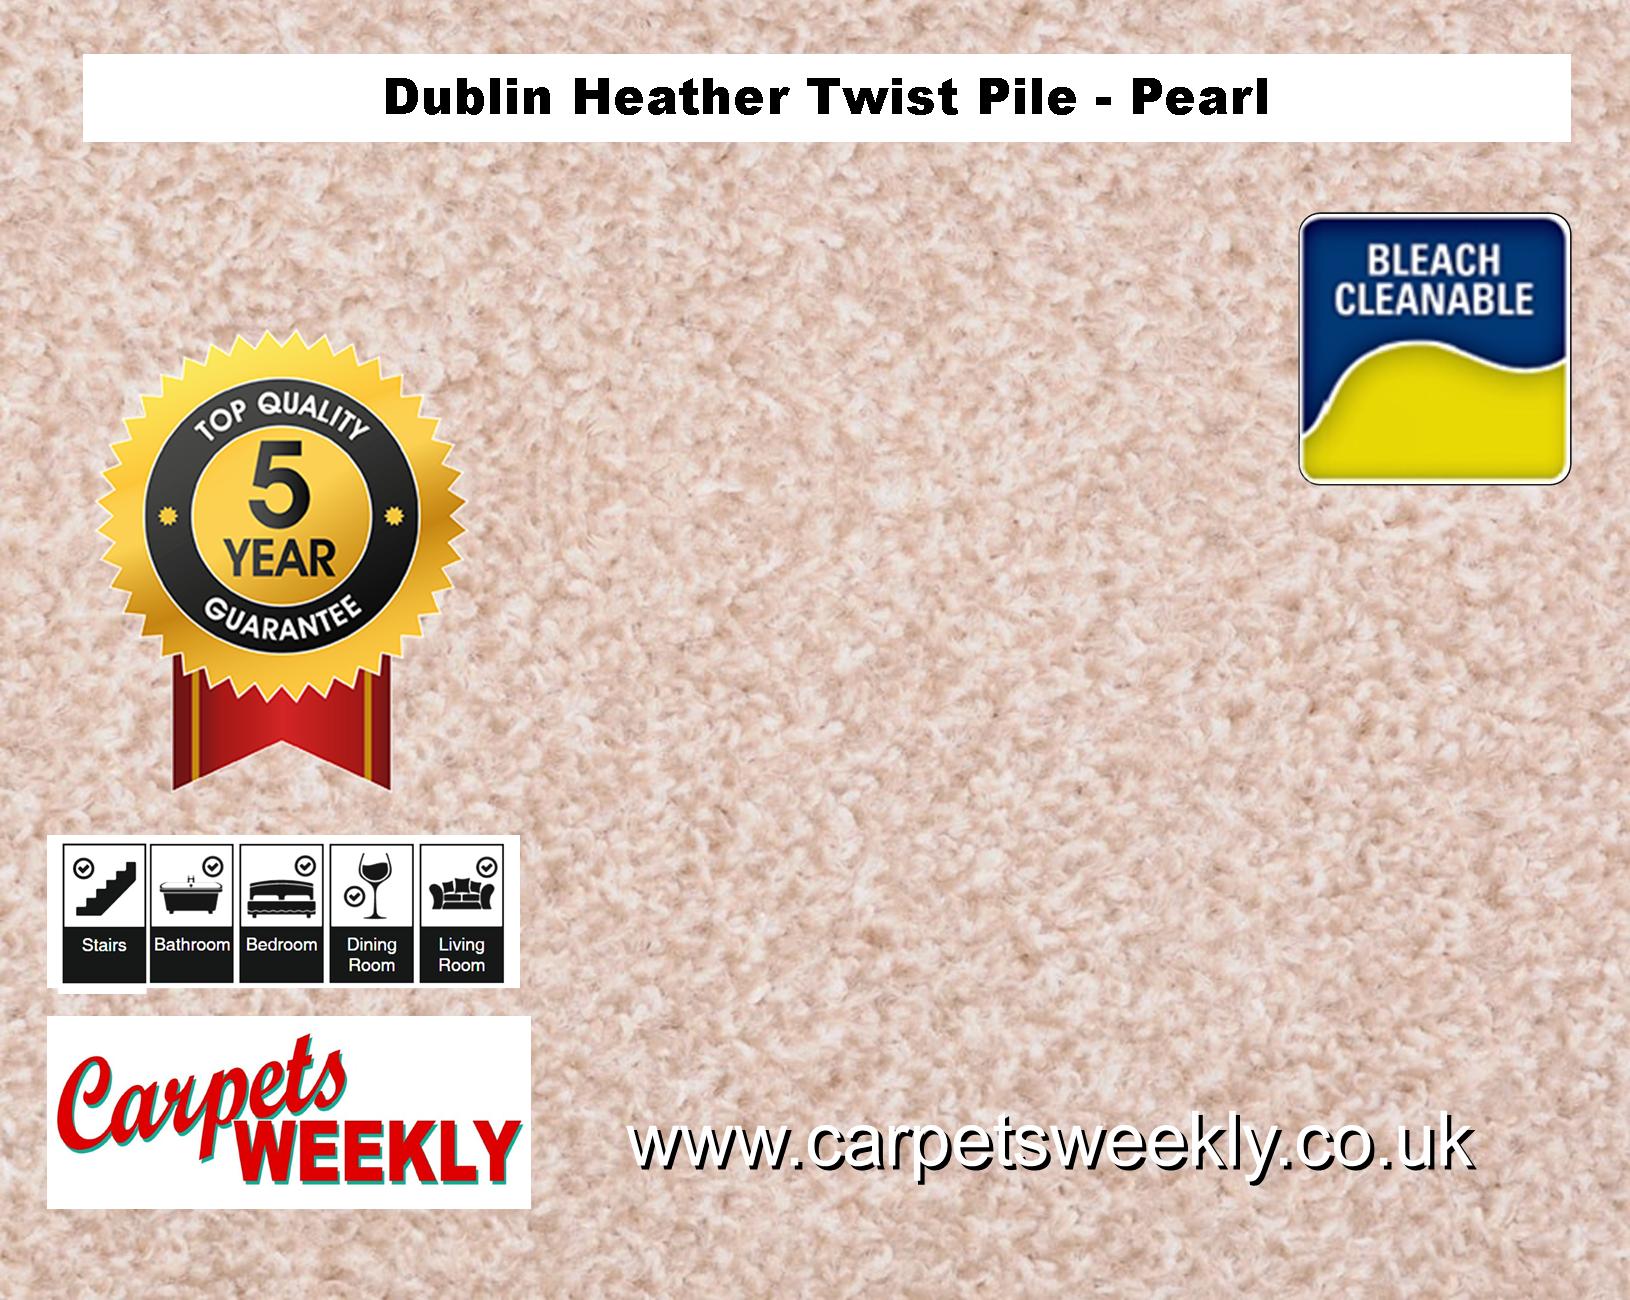 Carpets Weekly Dublin Heather Dublin Pearl - 305 mid range carpet